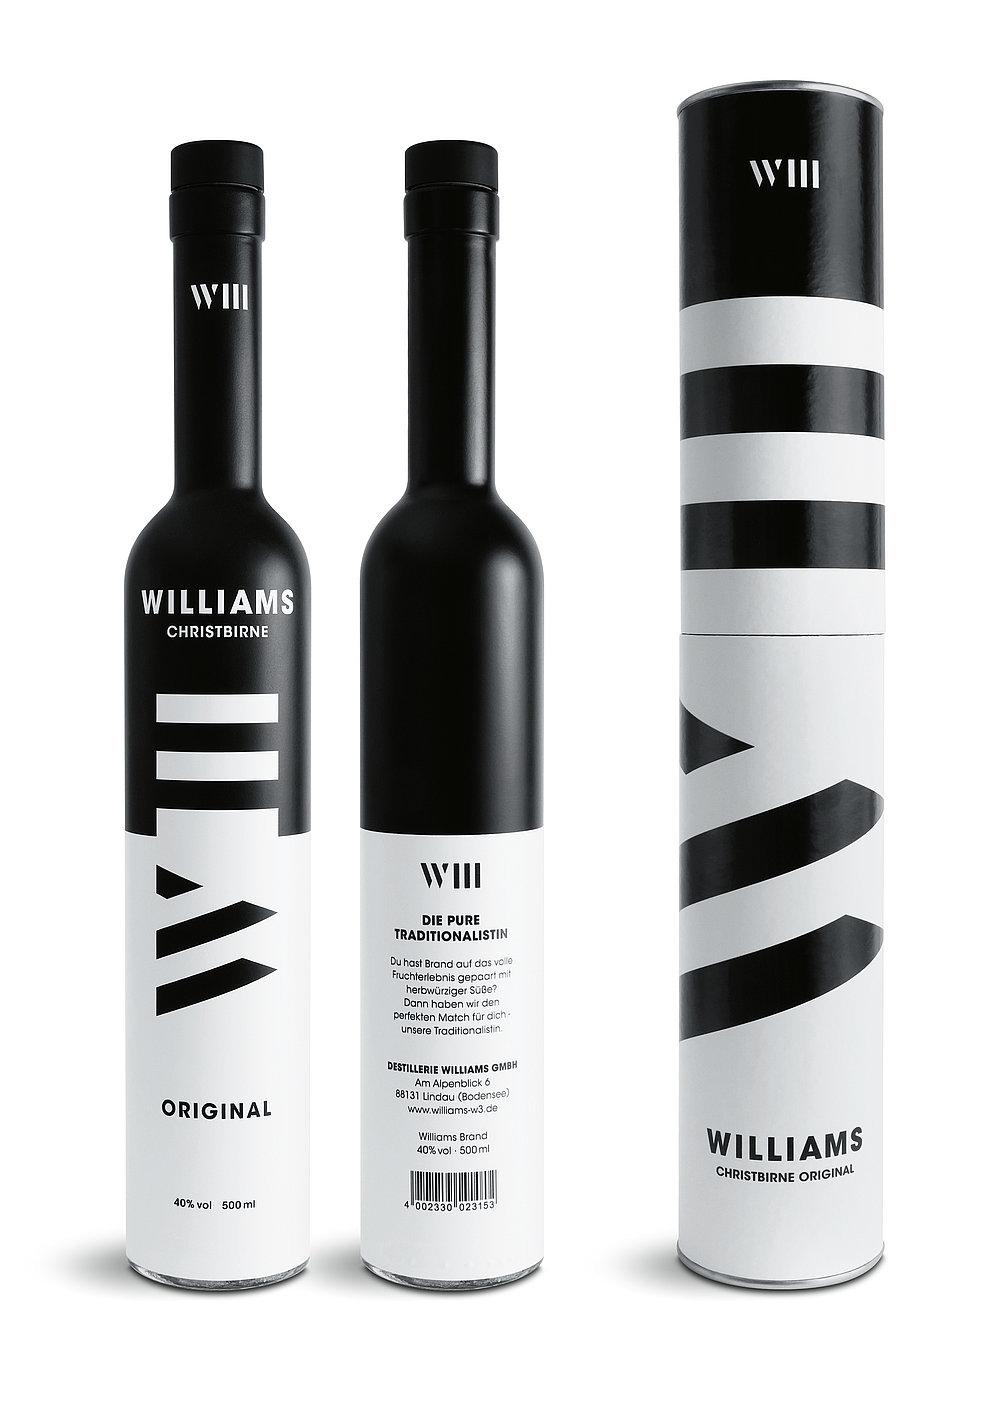 WIII – Williams Christbirne | Red Dot Design Award